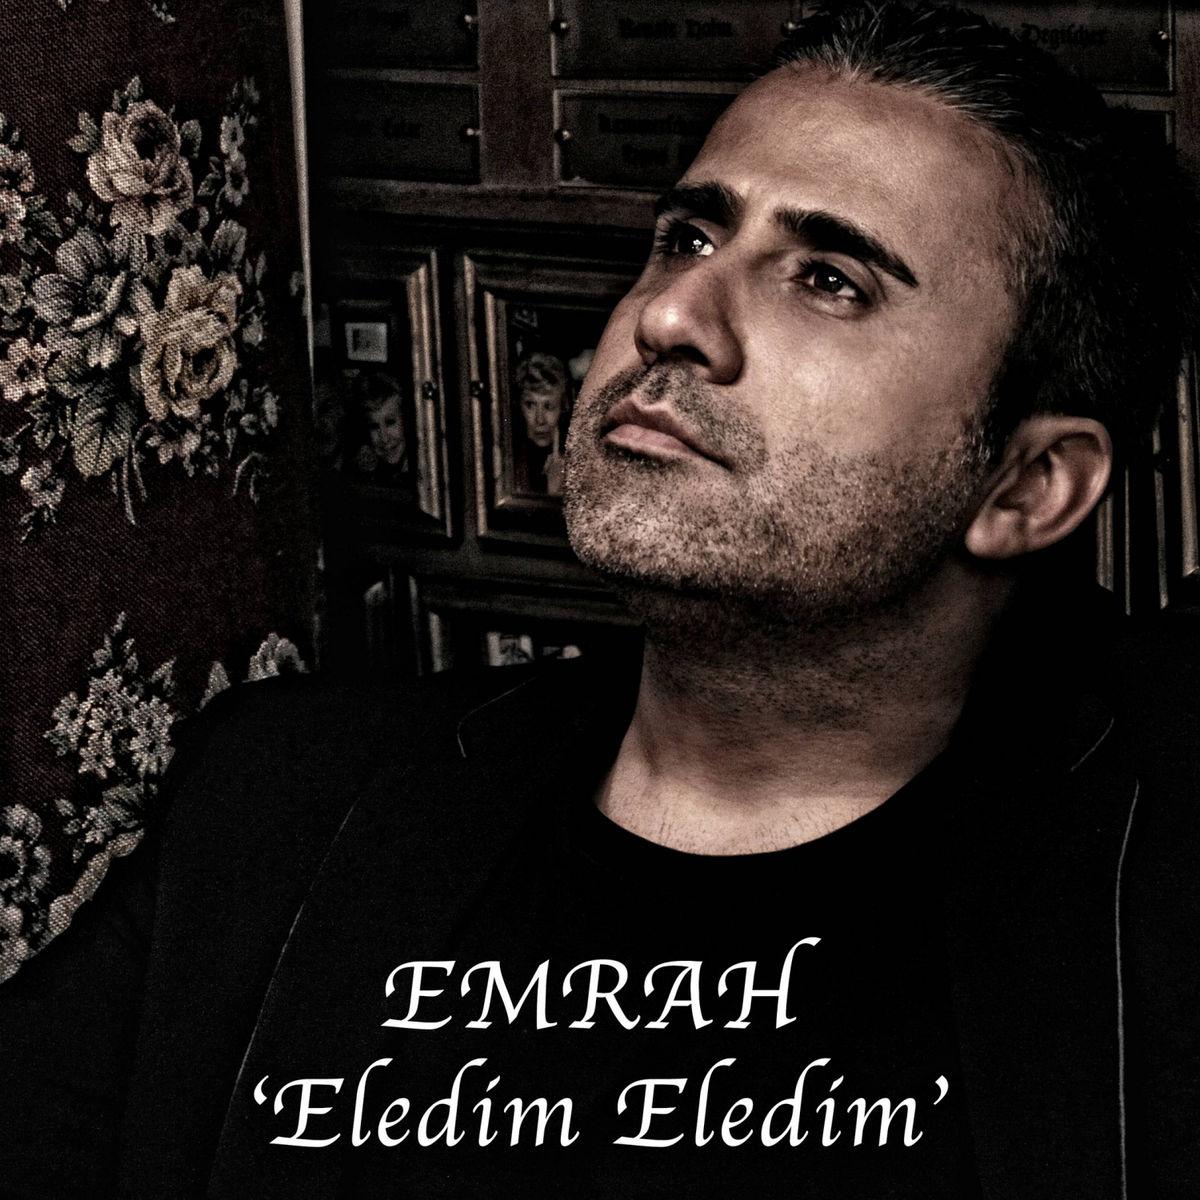 Emrah - Eledim Eledim